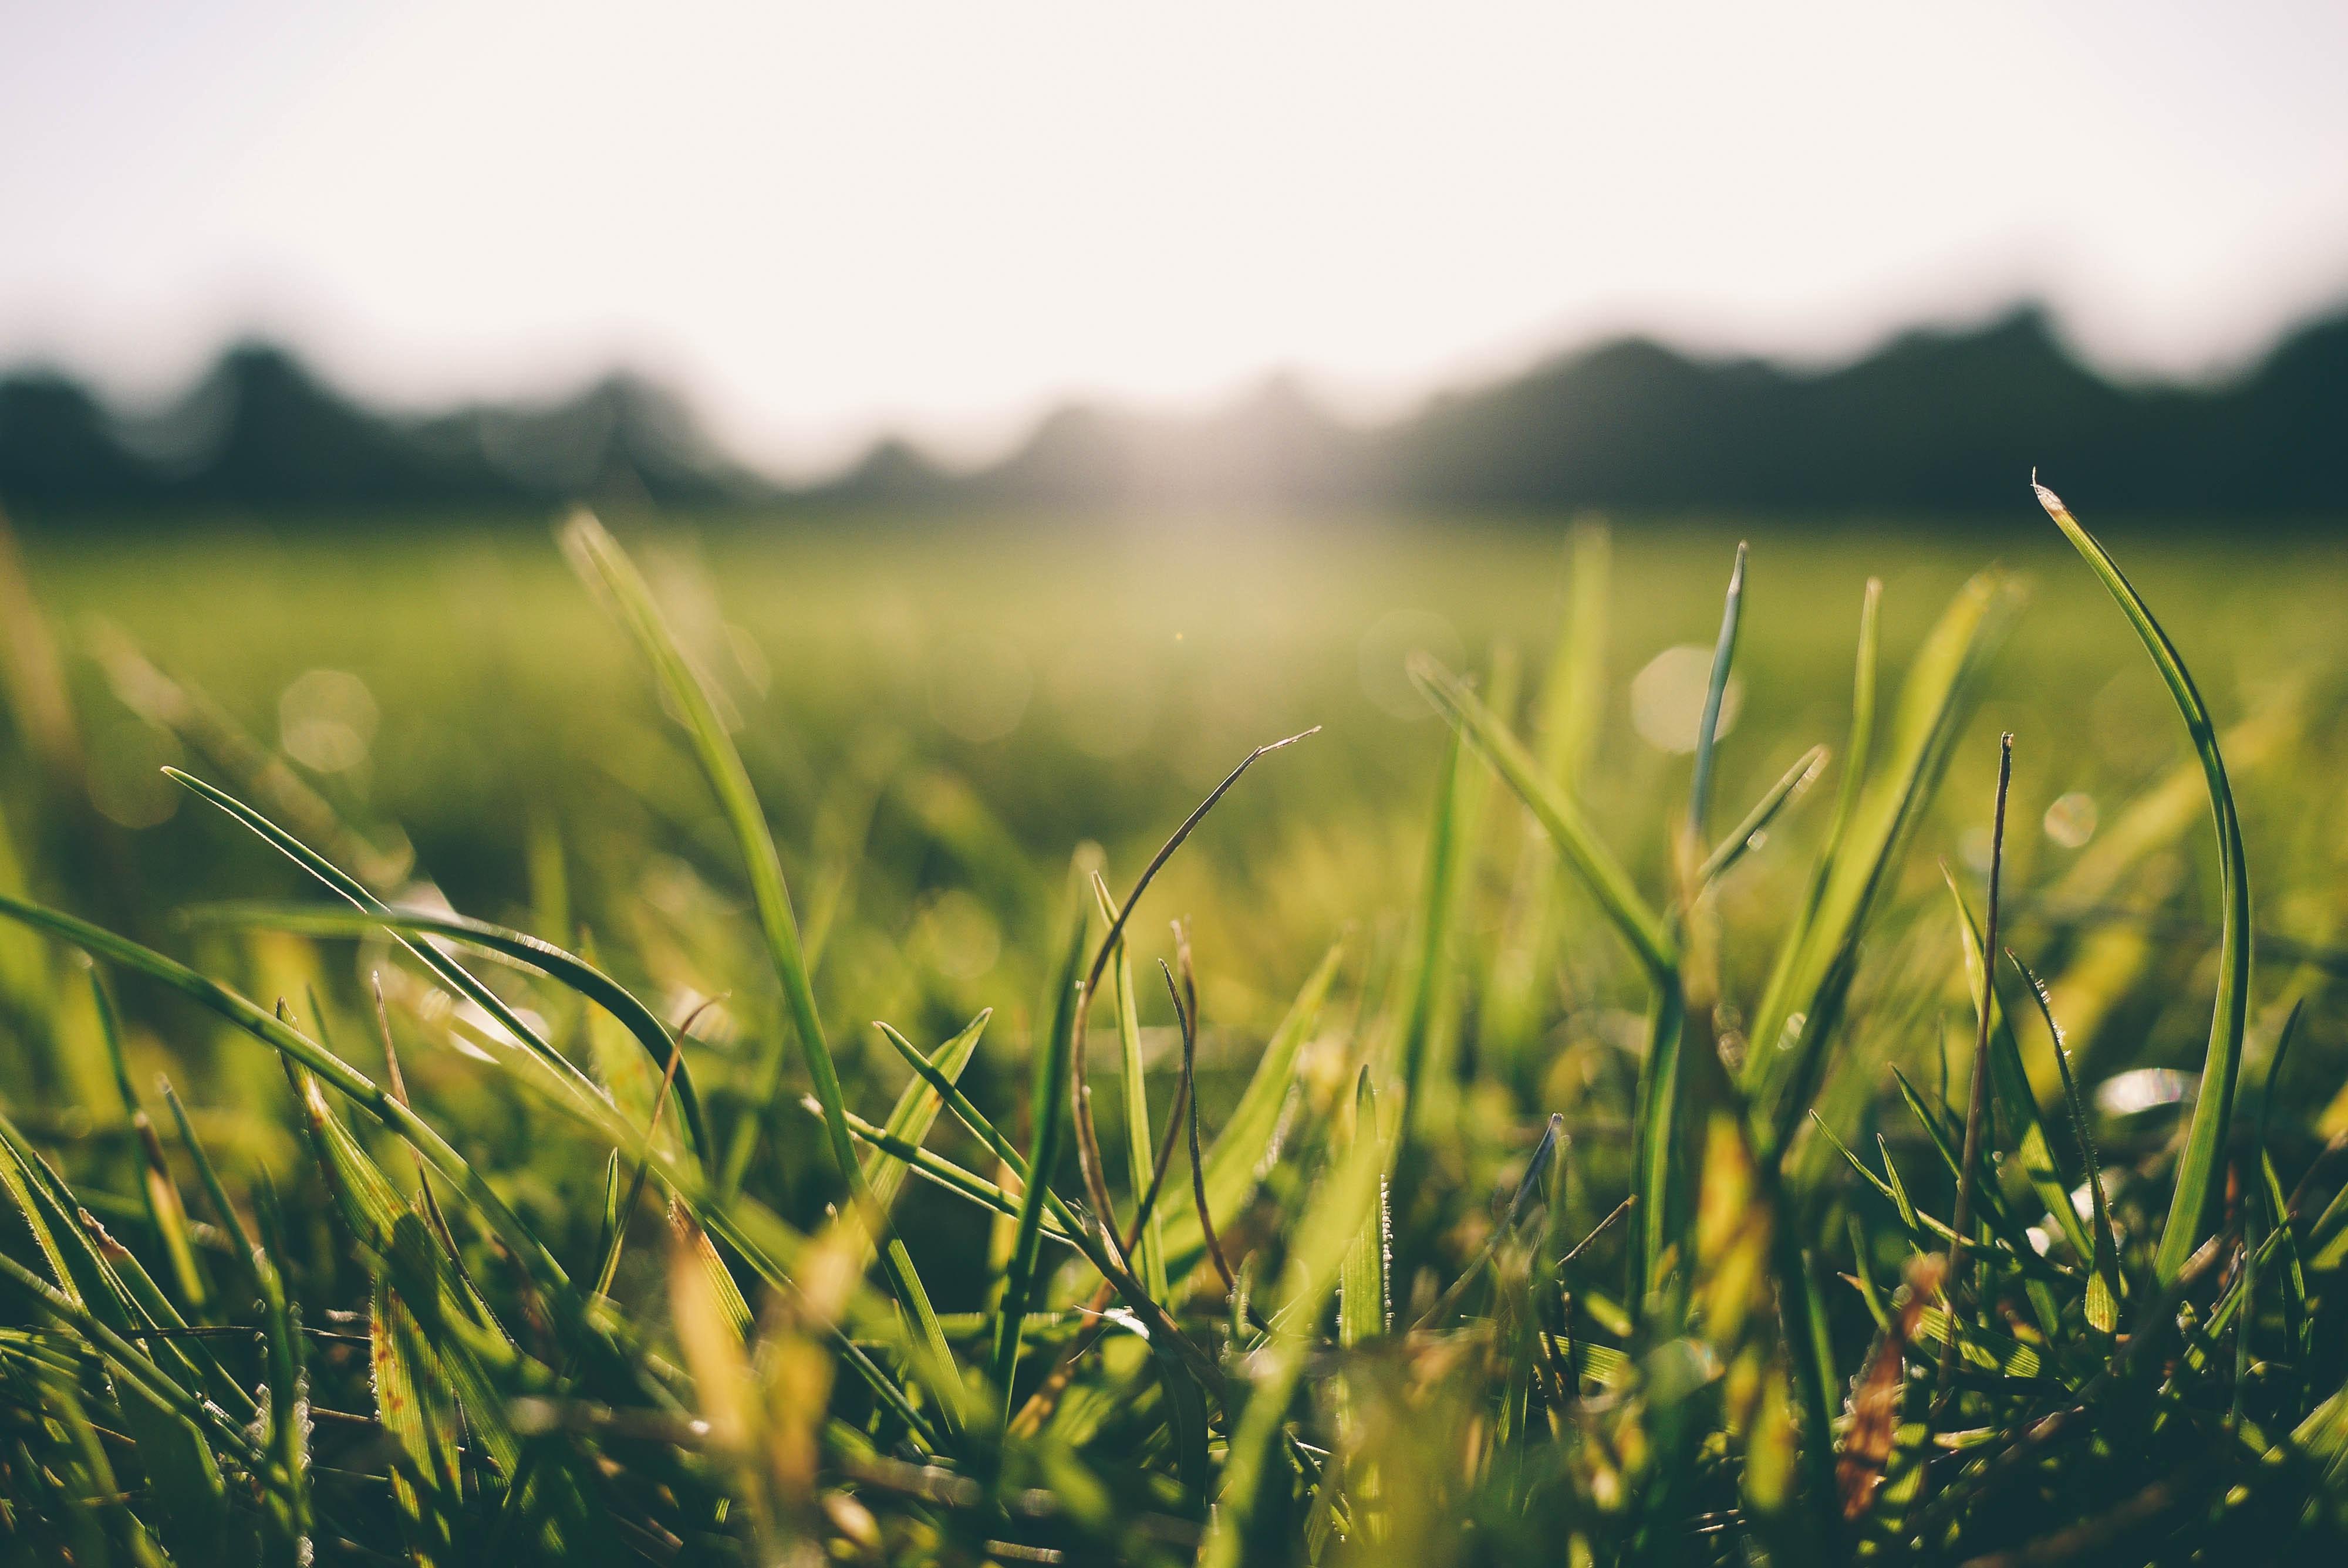 Sun shining on a grassy meadow